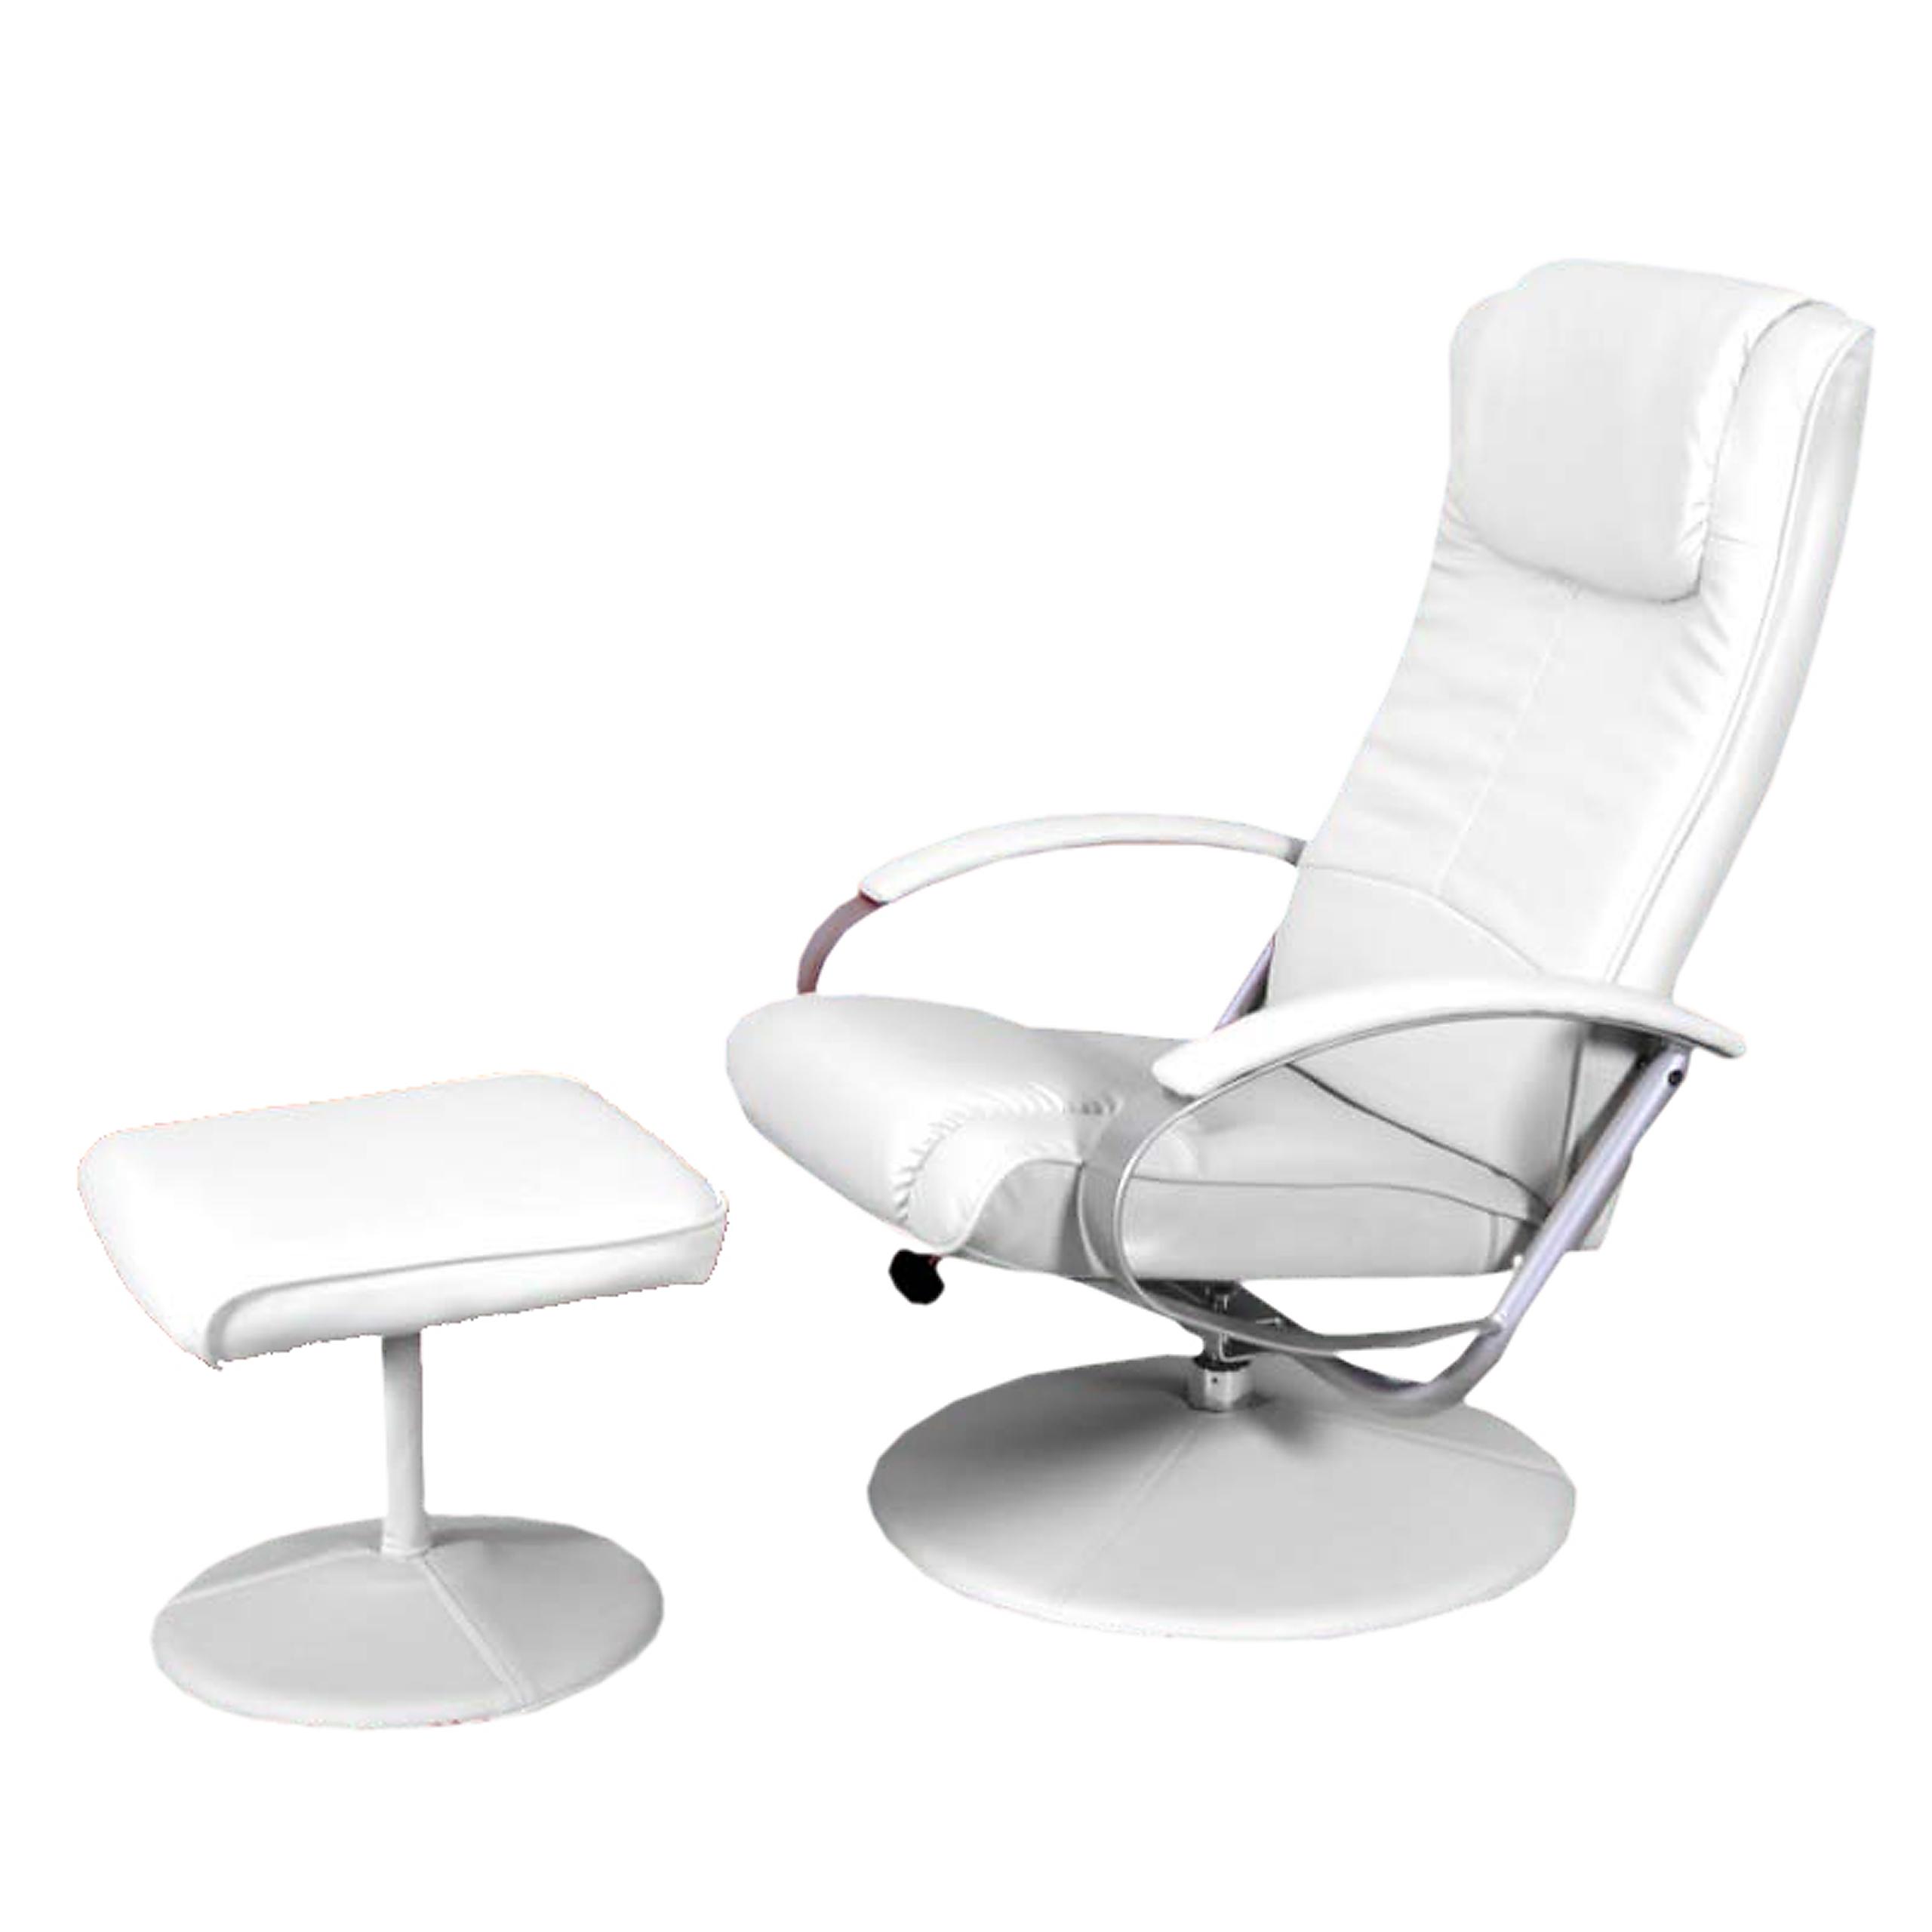 relaxsessel fernsehsessel relaxliege n44 mit hocker wei. Black Bedroom Furniture Sets. Home Design Ideas